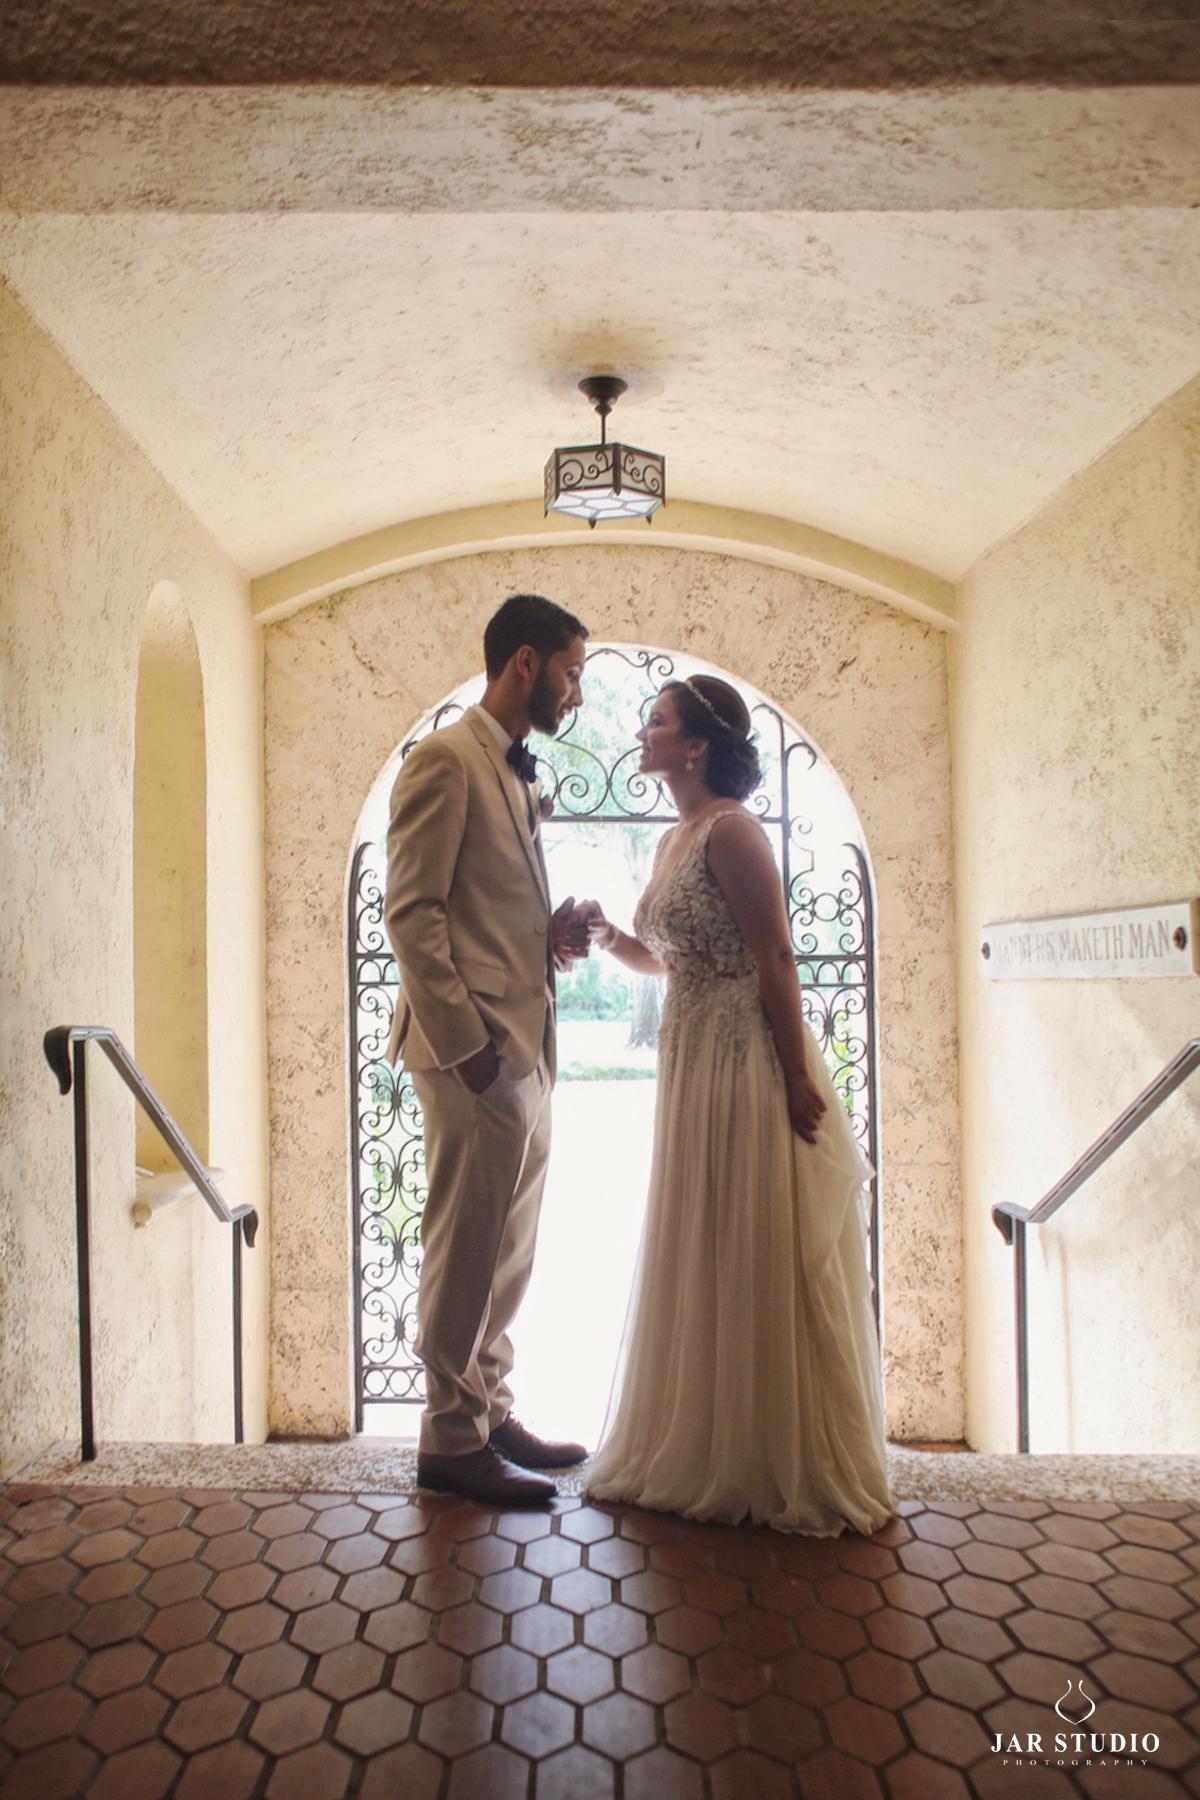 romantic-rollins-jarstudio-wedding-photographer-416.JPG